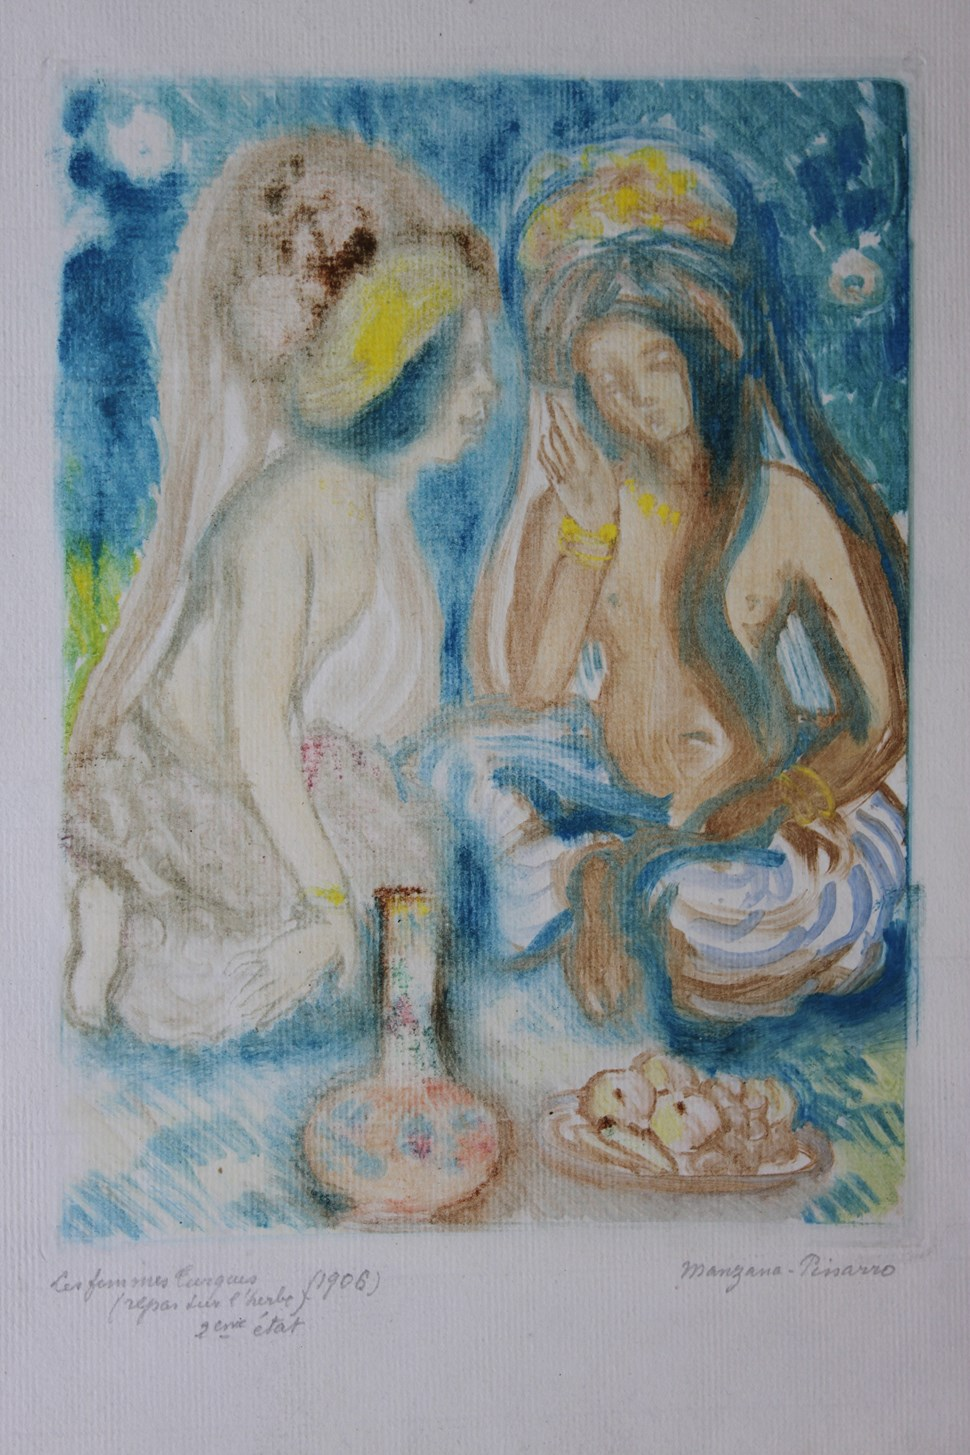 Les Femmes Turques (Repos sur l'Herbe) - Georges Manzana Pissarro (1871 - 1961)